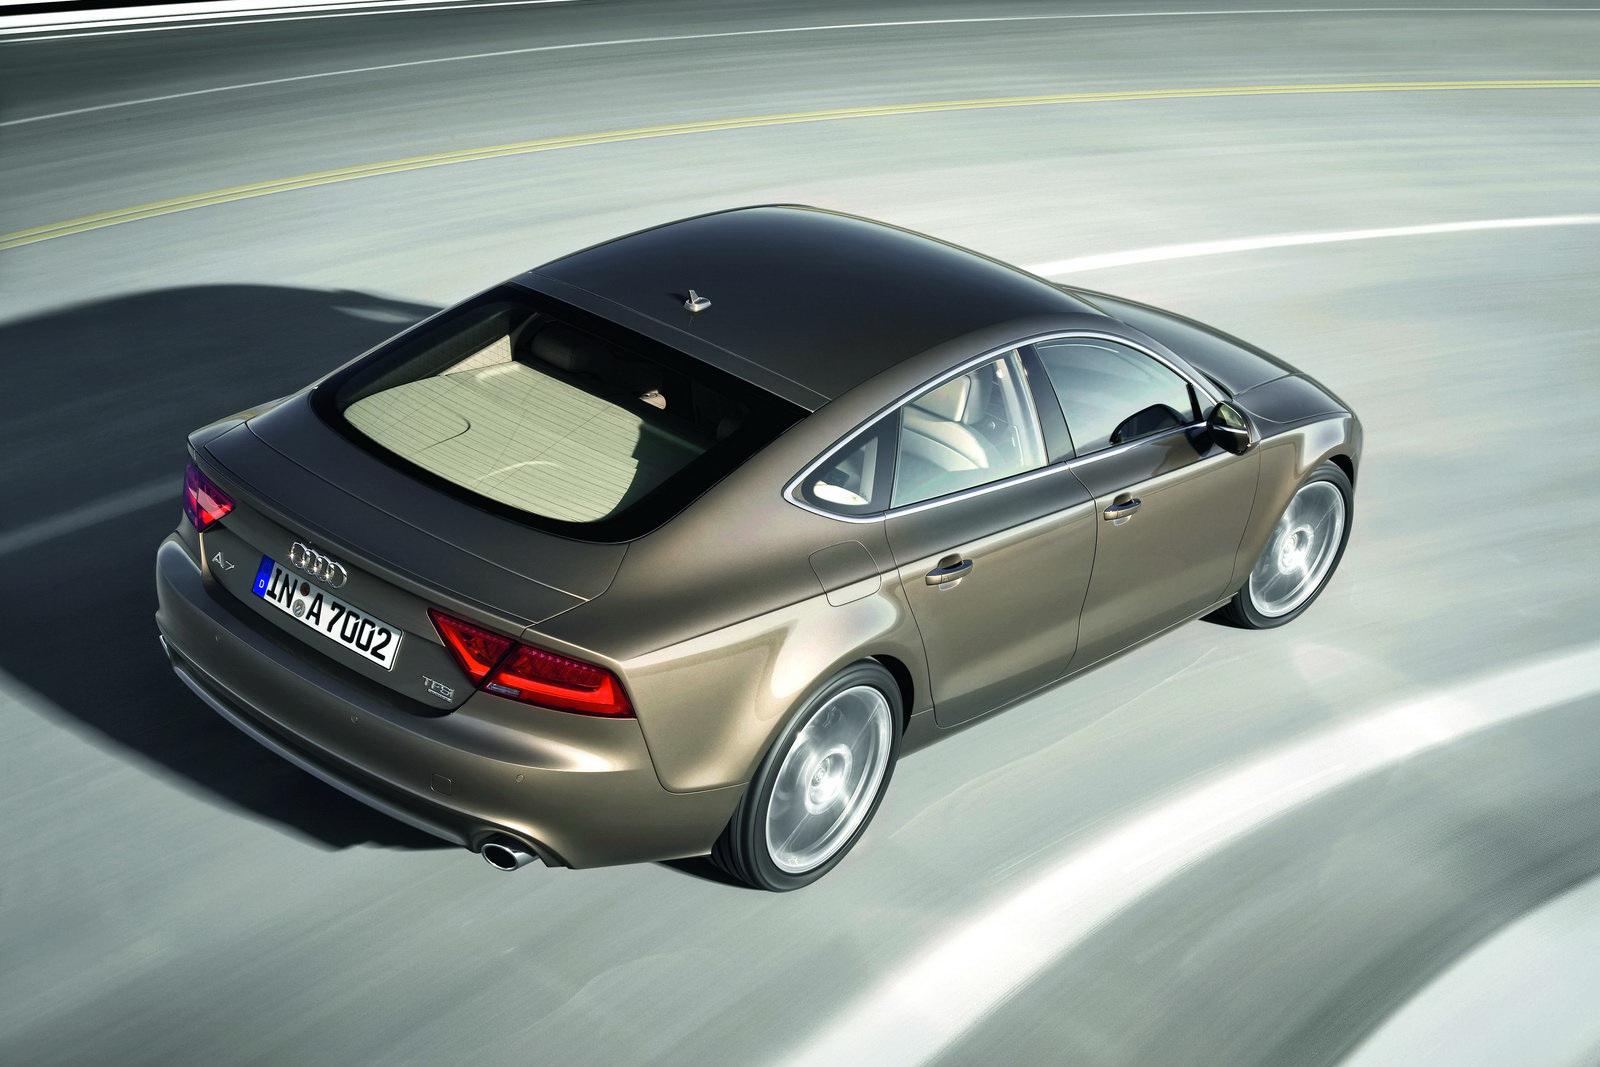 Audi A7 2020 Exterior Rear View